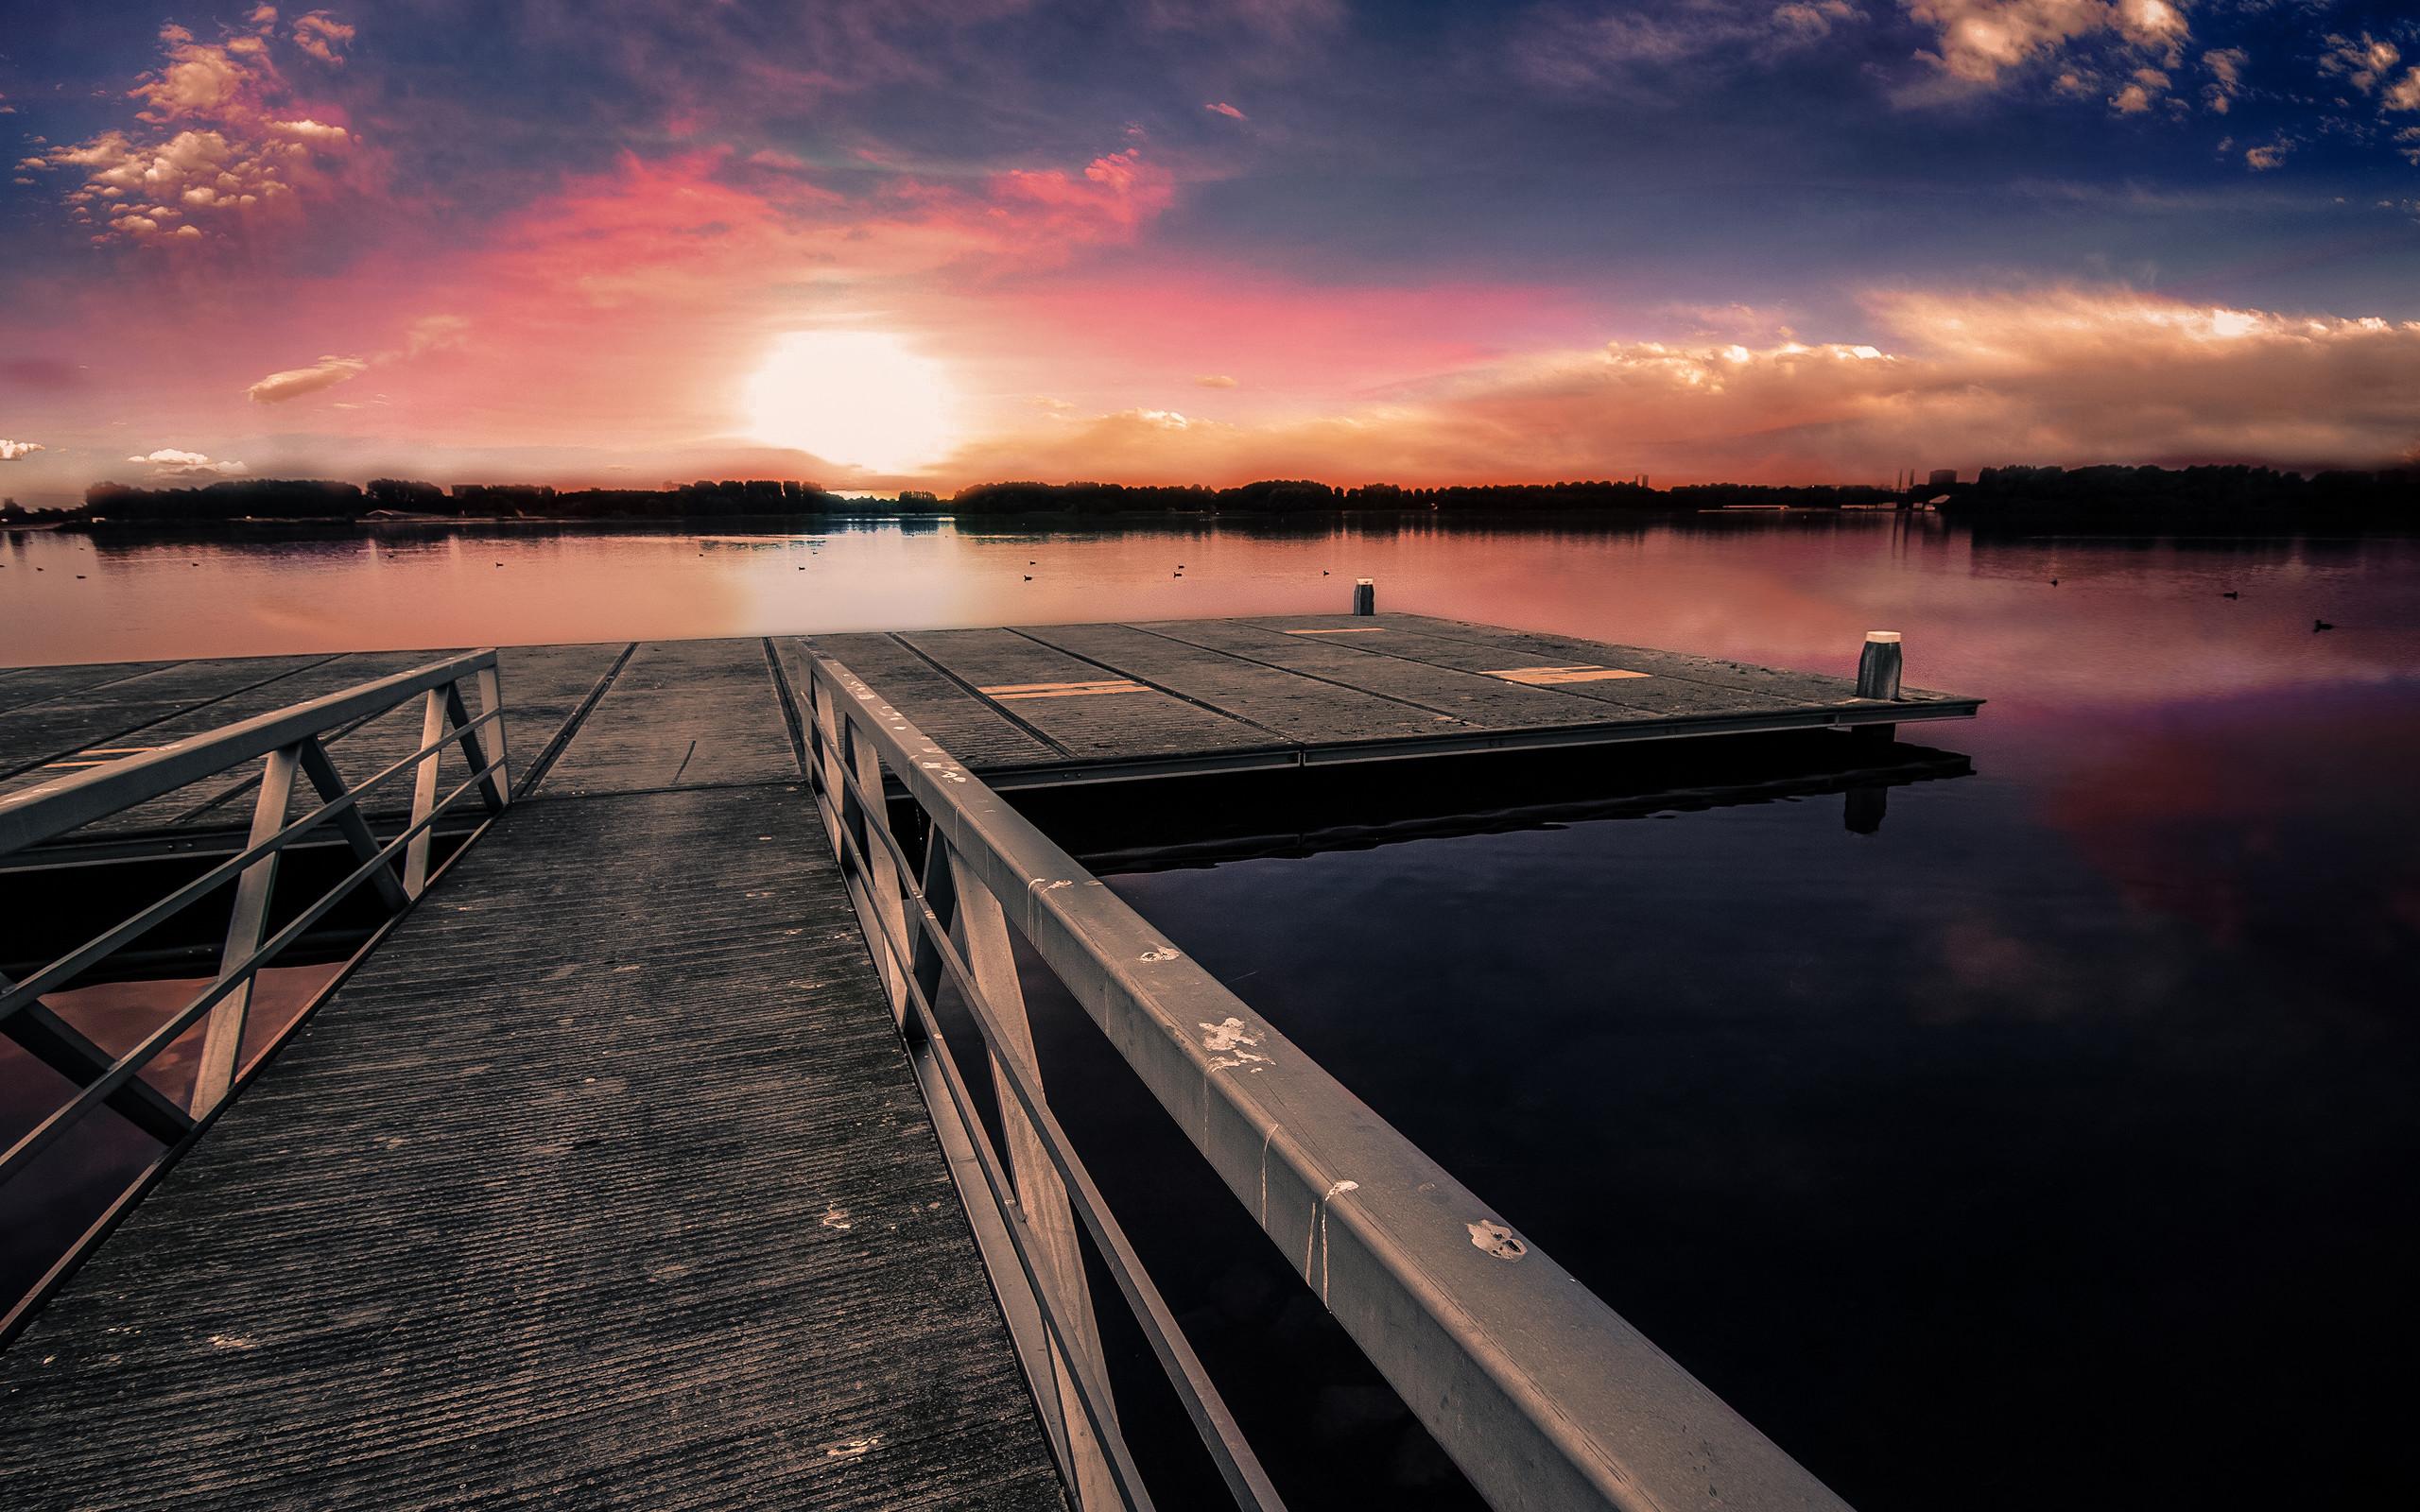 2560x1600 Beautiful Beach Sunset Wallpaper Desktop BackgroundsPhotos In HD Widescreen High Quality Resolutions For Free